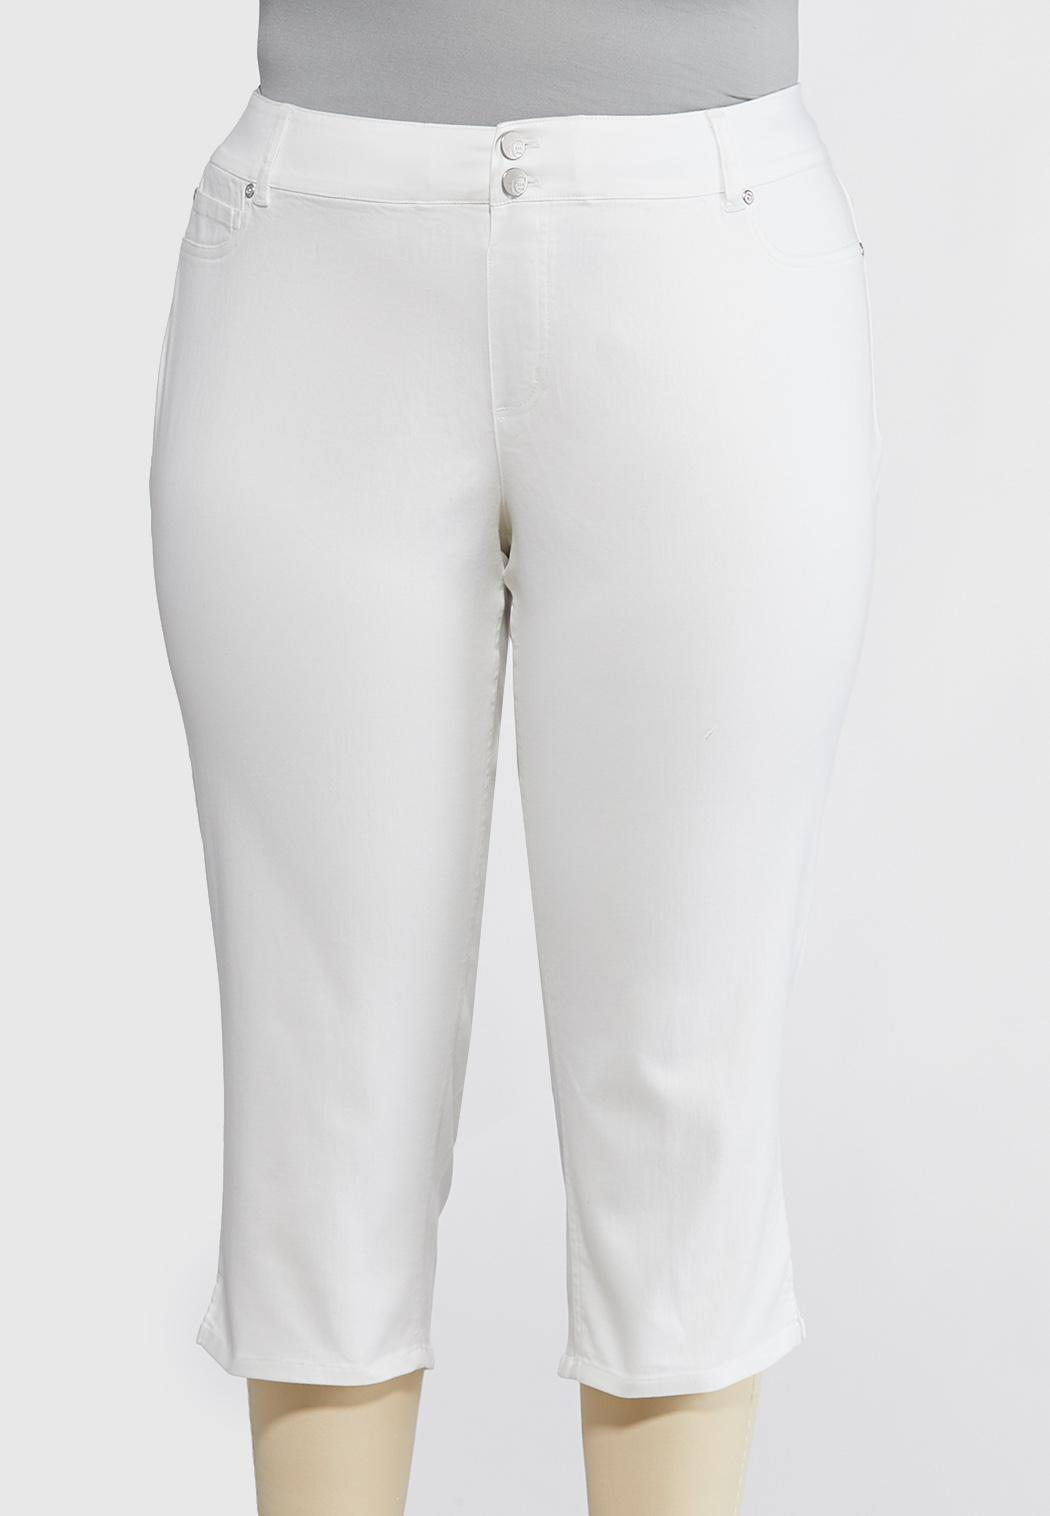 7a44c619c7 Plus Size White Cropped Skinny Jeans Denim Cato Fashions